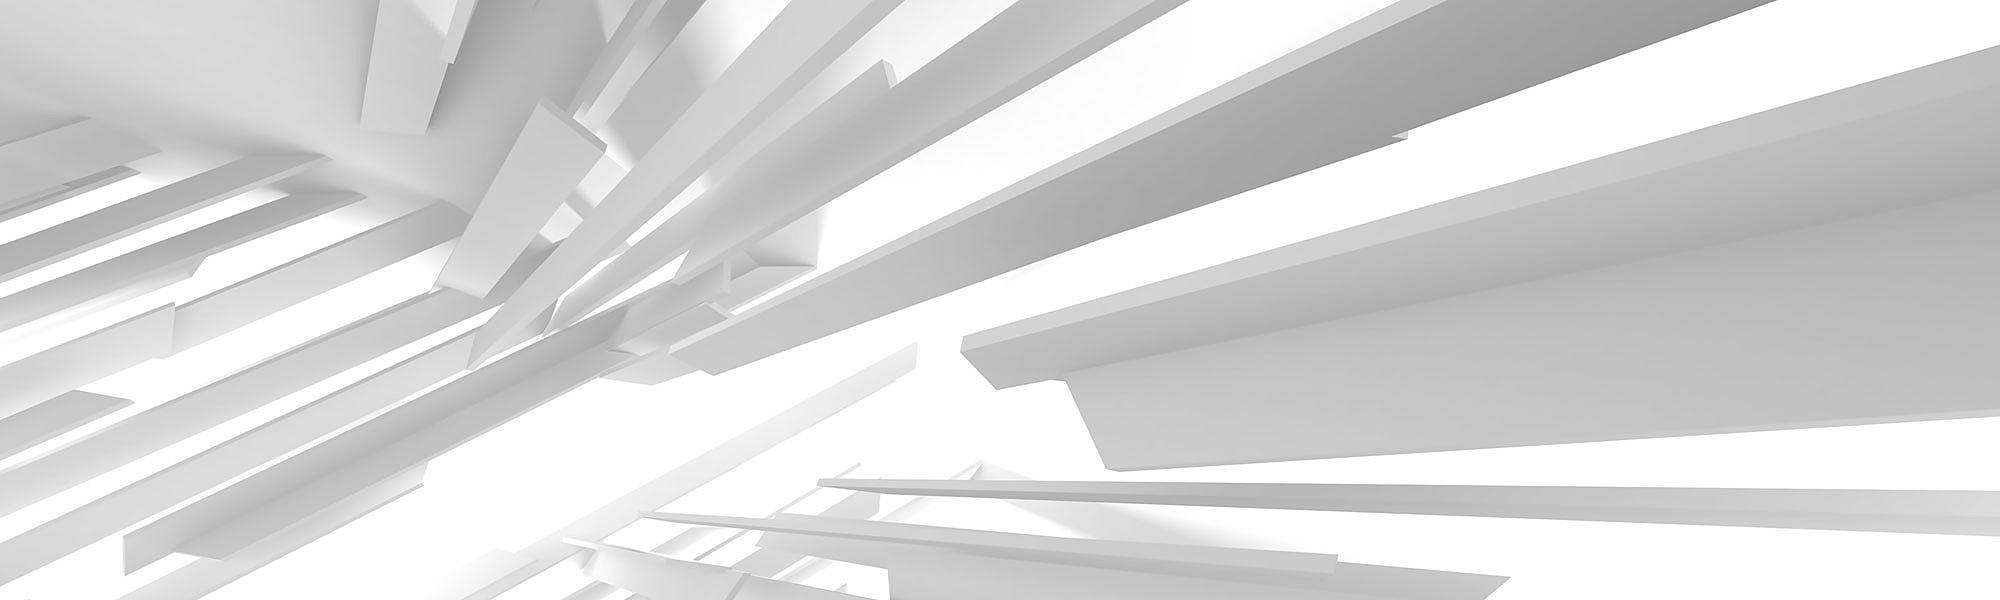 banner-149-interview-denkraeume-01.jpg